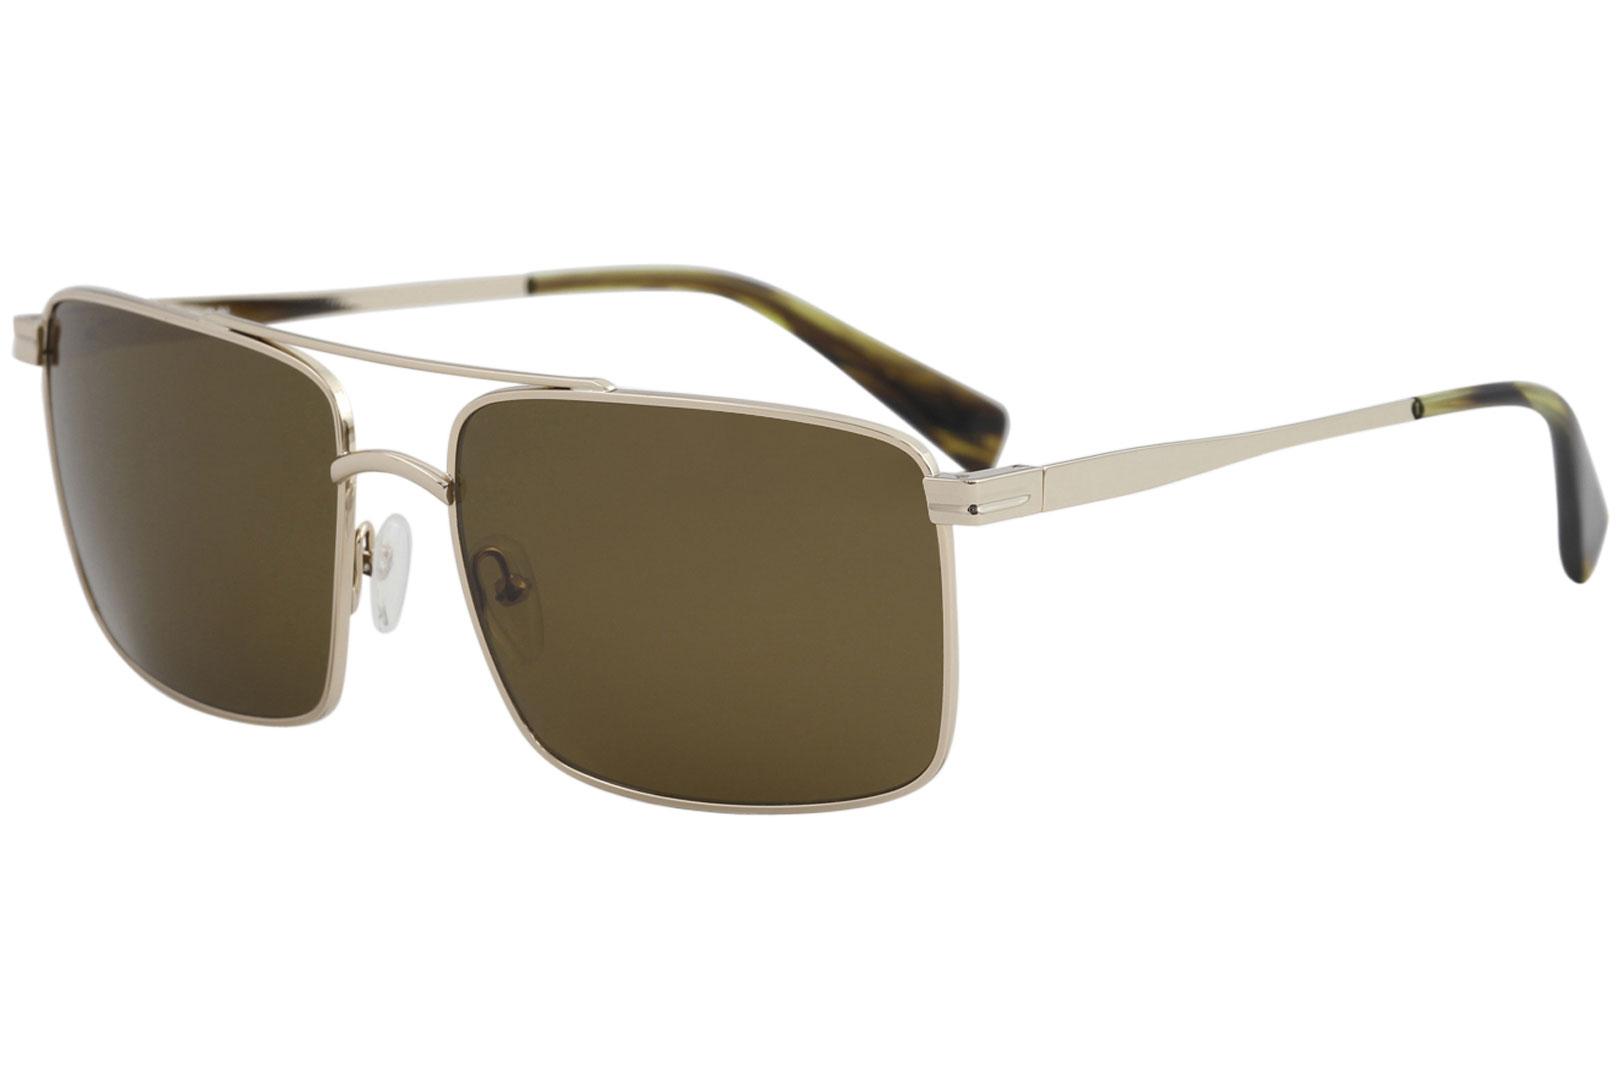 69c0ae8d8c4 Kaenon Knolls Gold Tortoise Brown Lenses Polarized Sunglasses ...